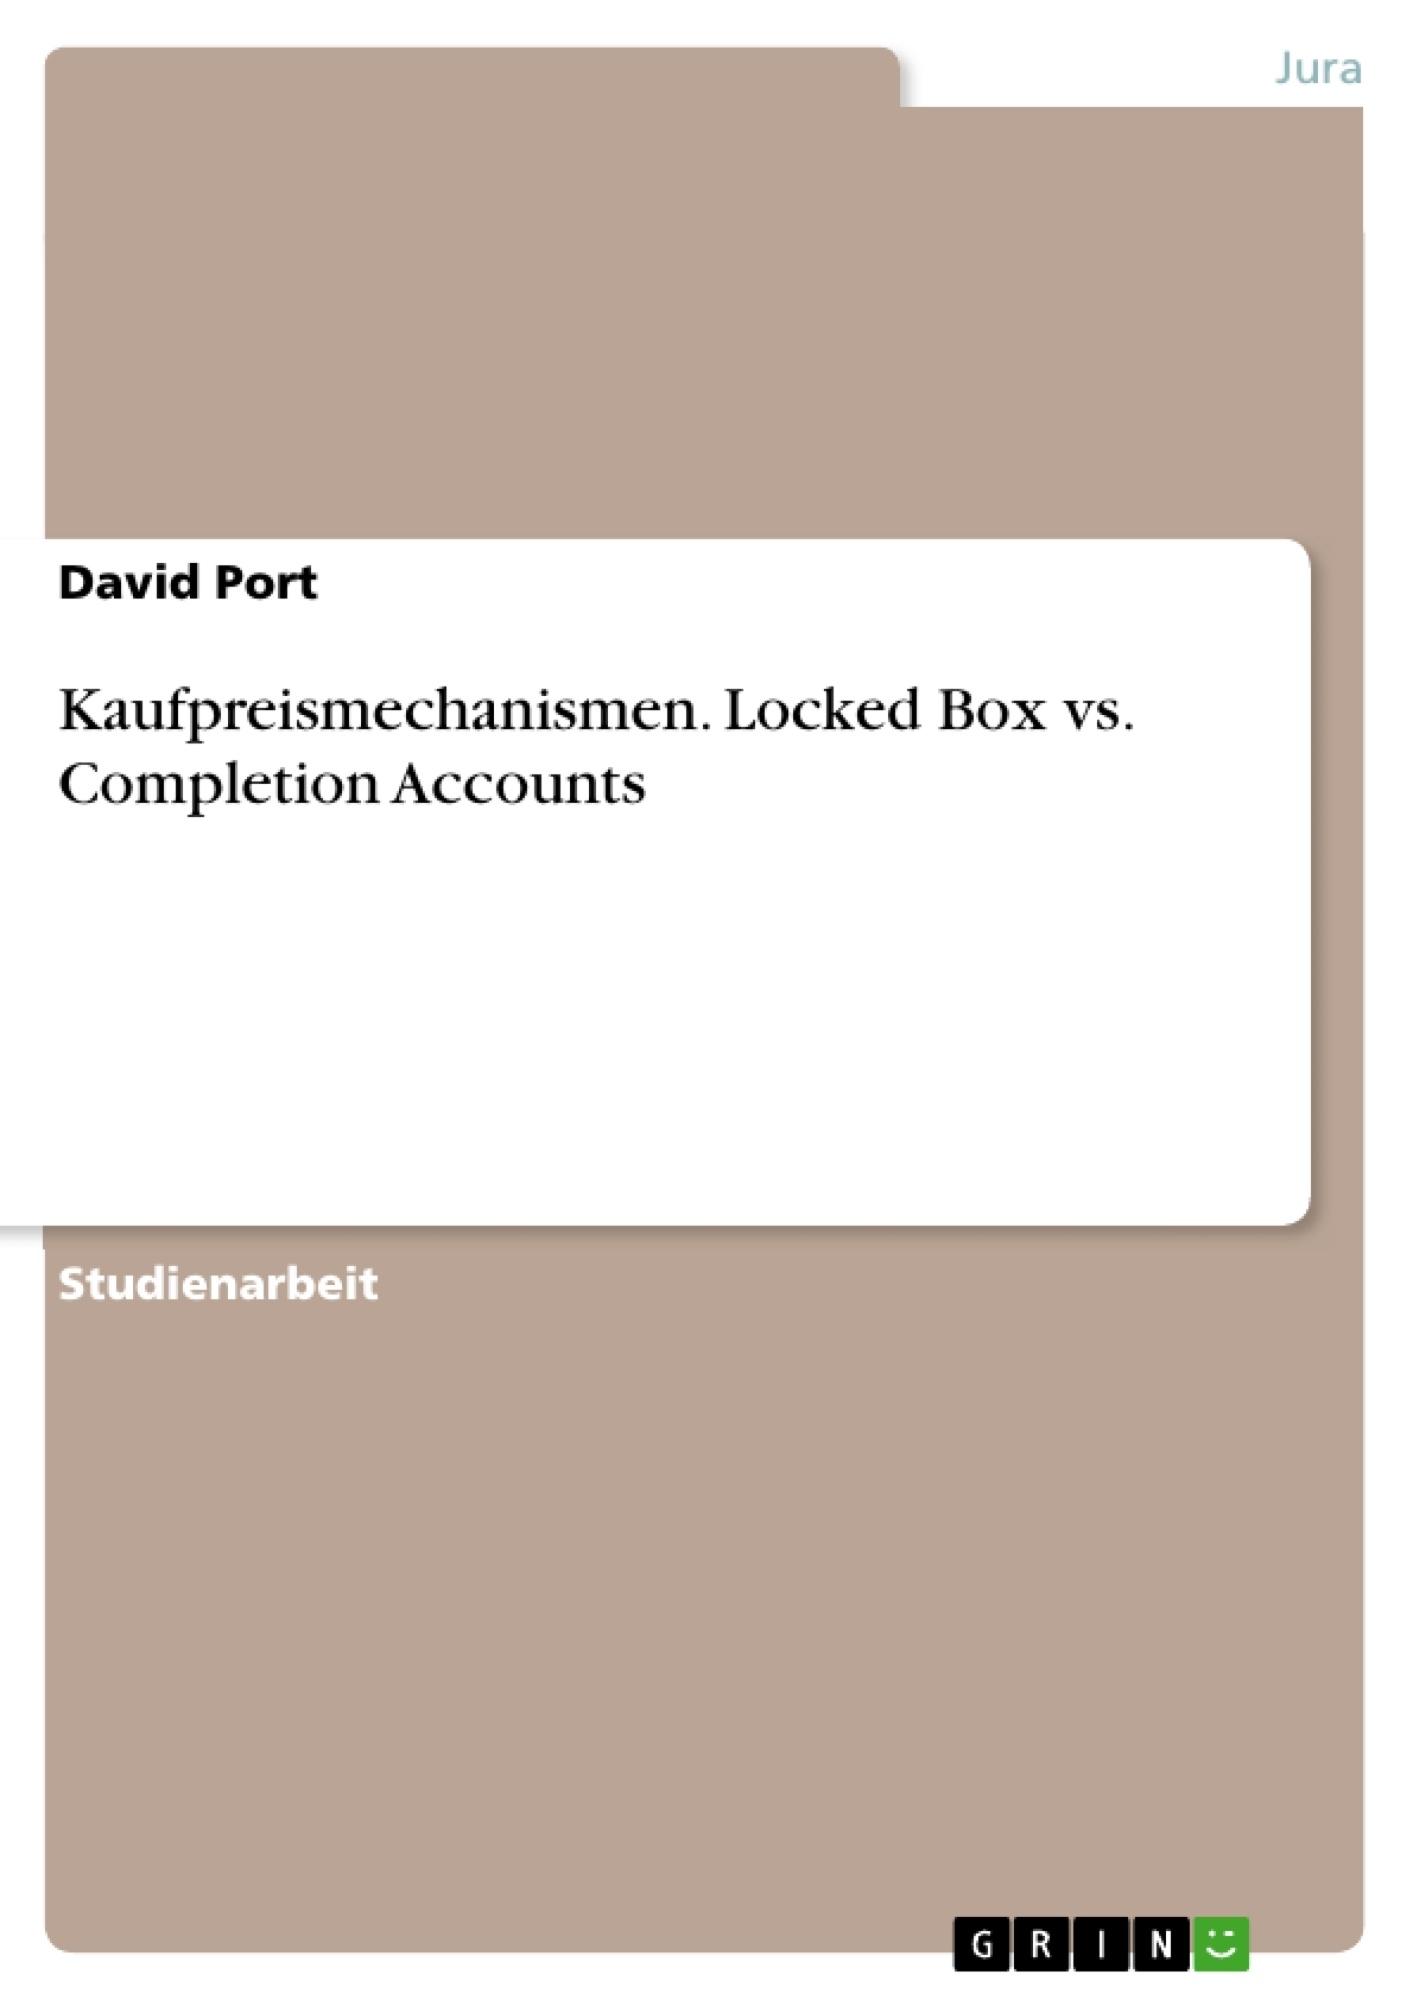 Titel: Kaufpreismechanismen. Locked Box vs. Completion Accounts